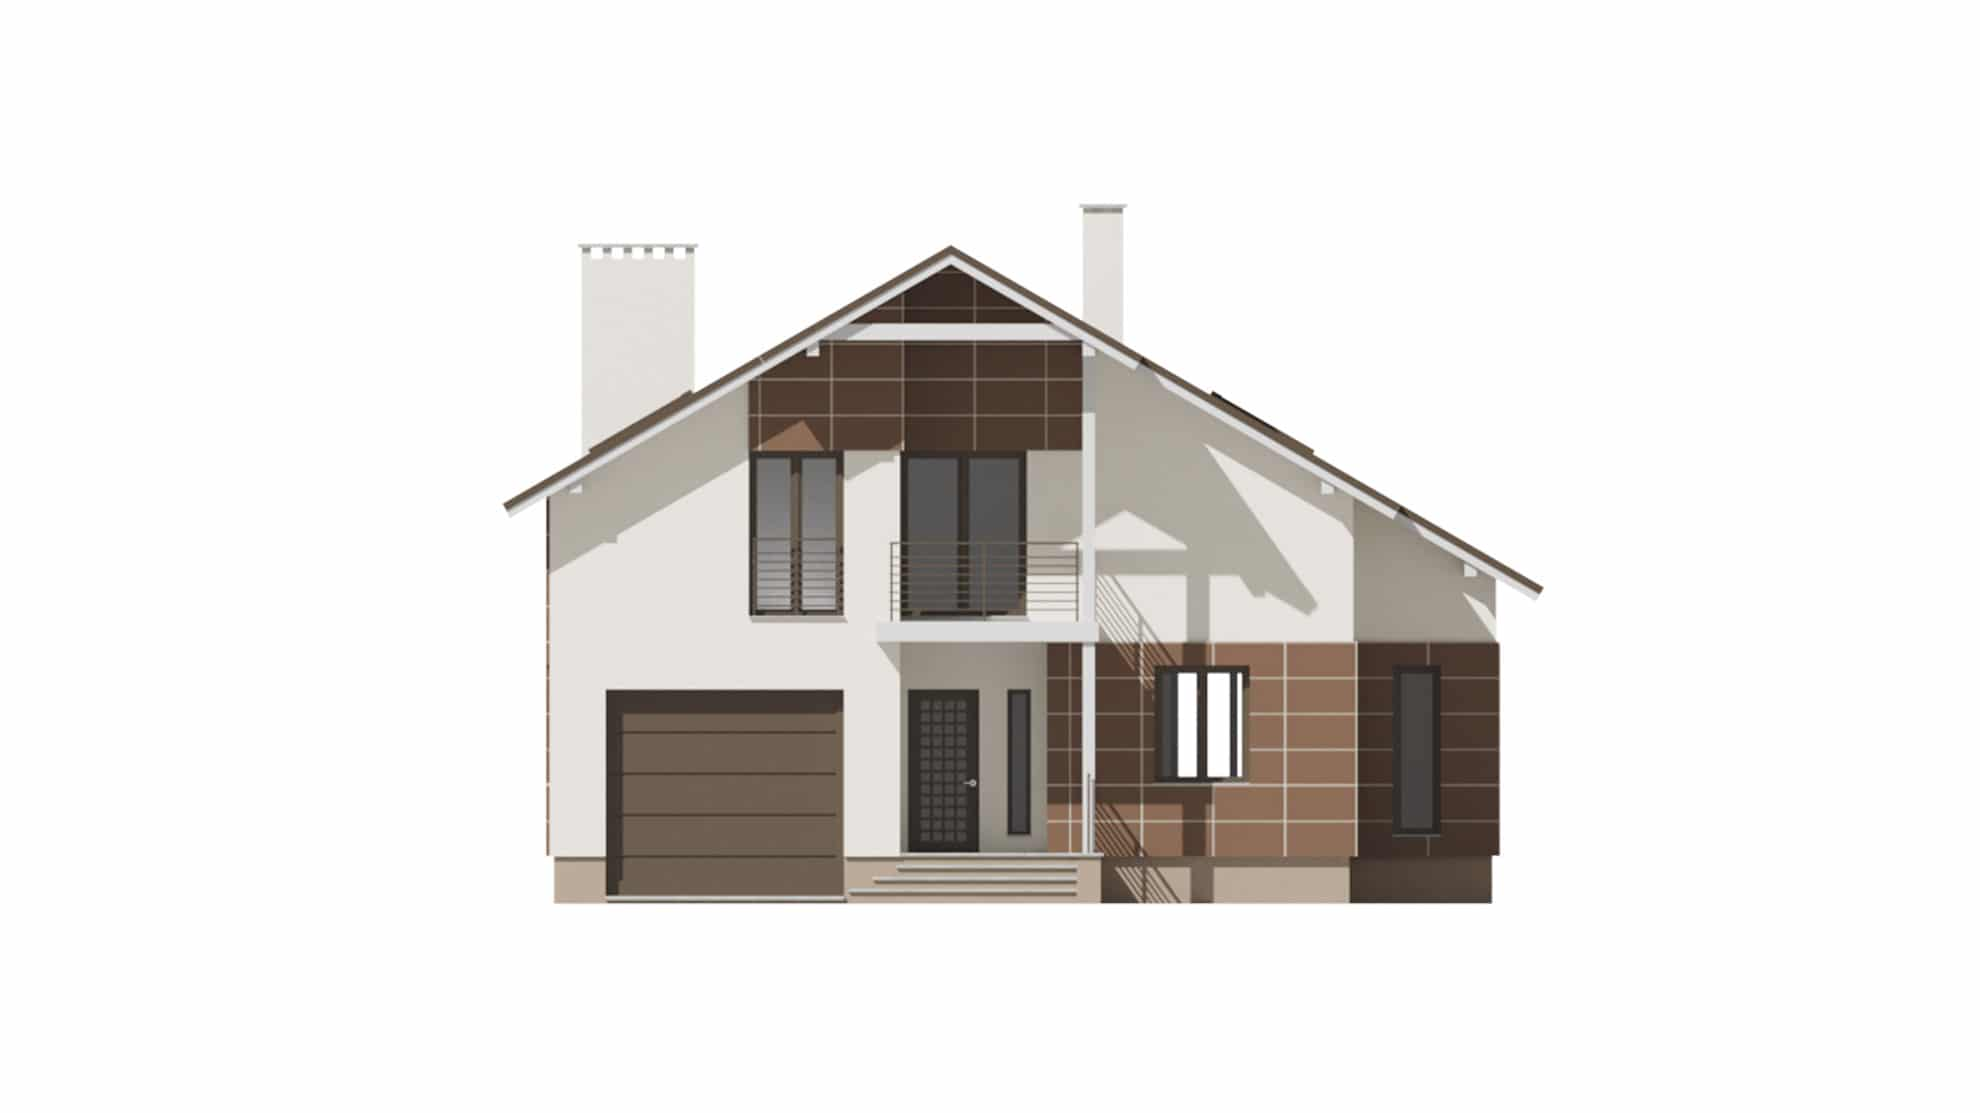 Фасад мансардного дома с гаражом и балконом «КМ-59» - спереди